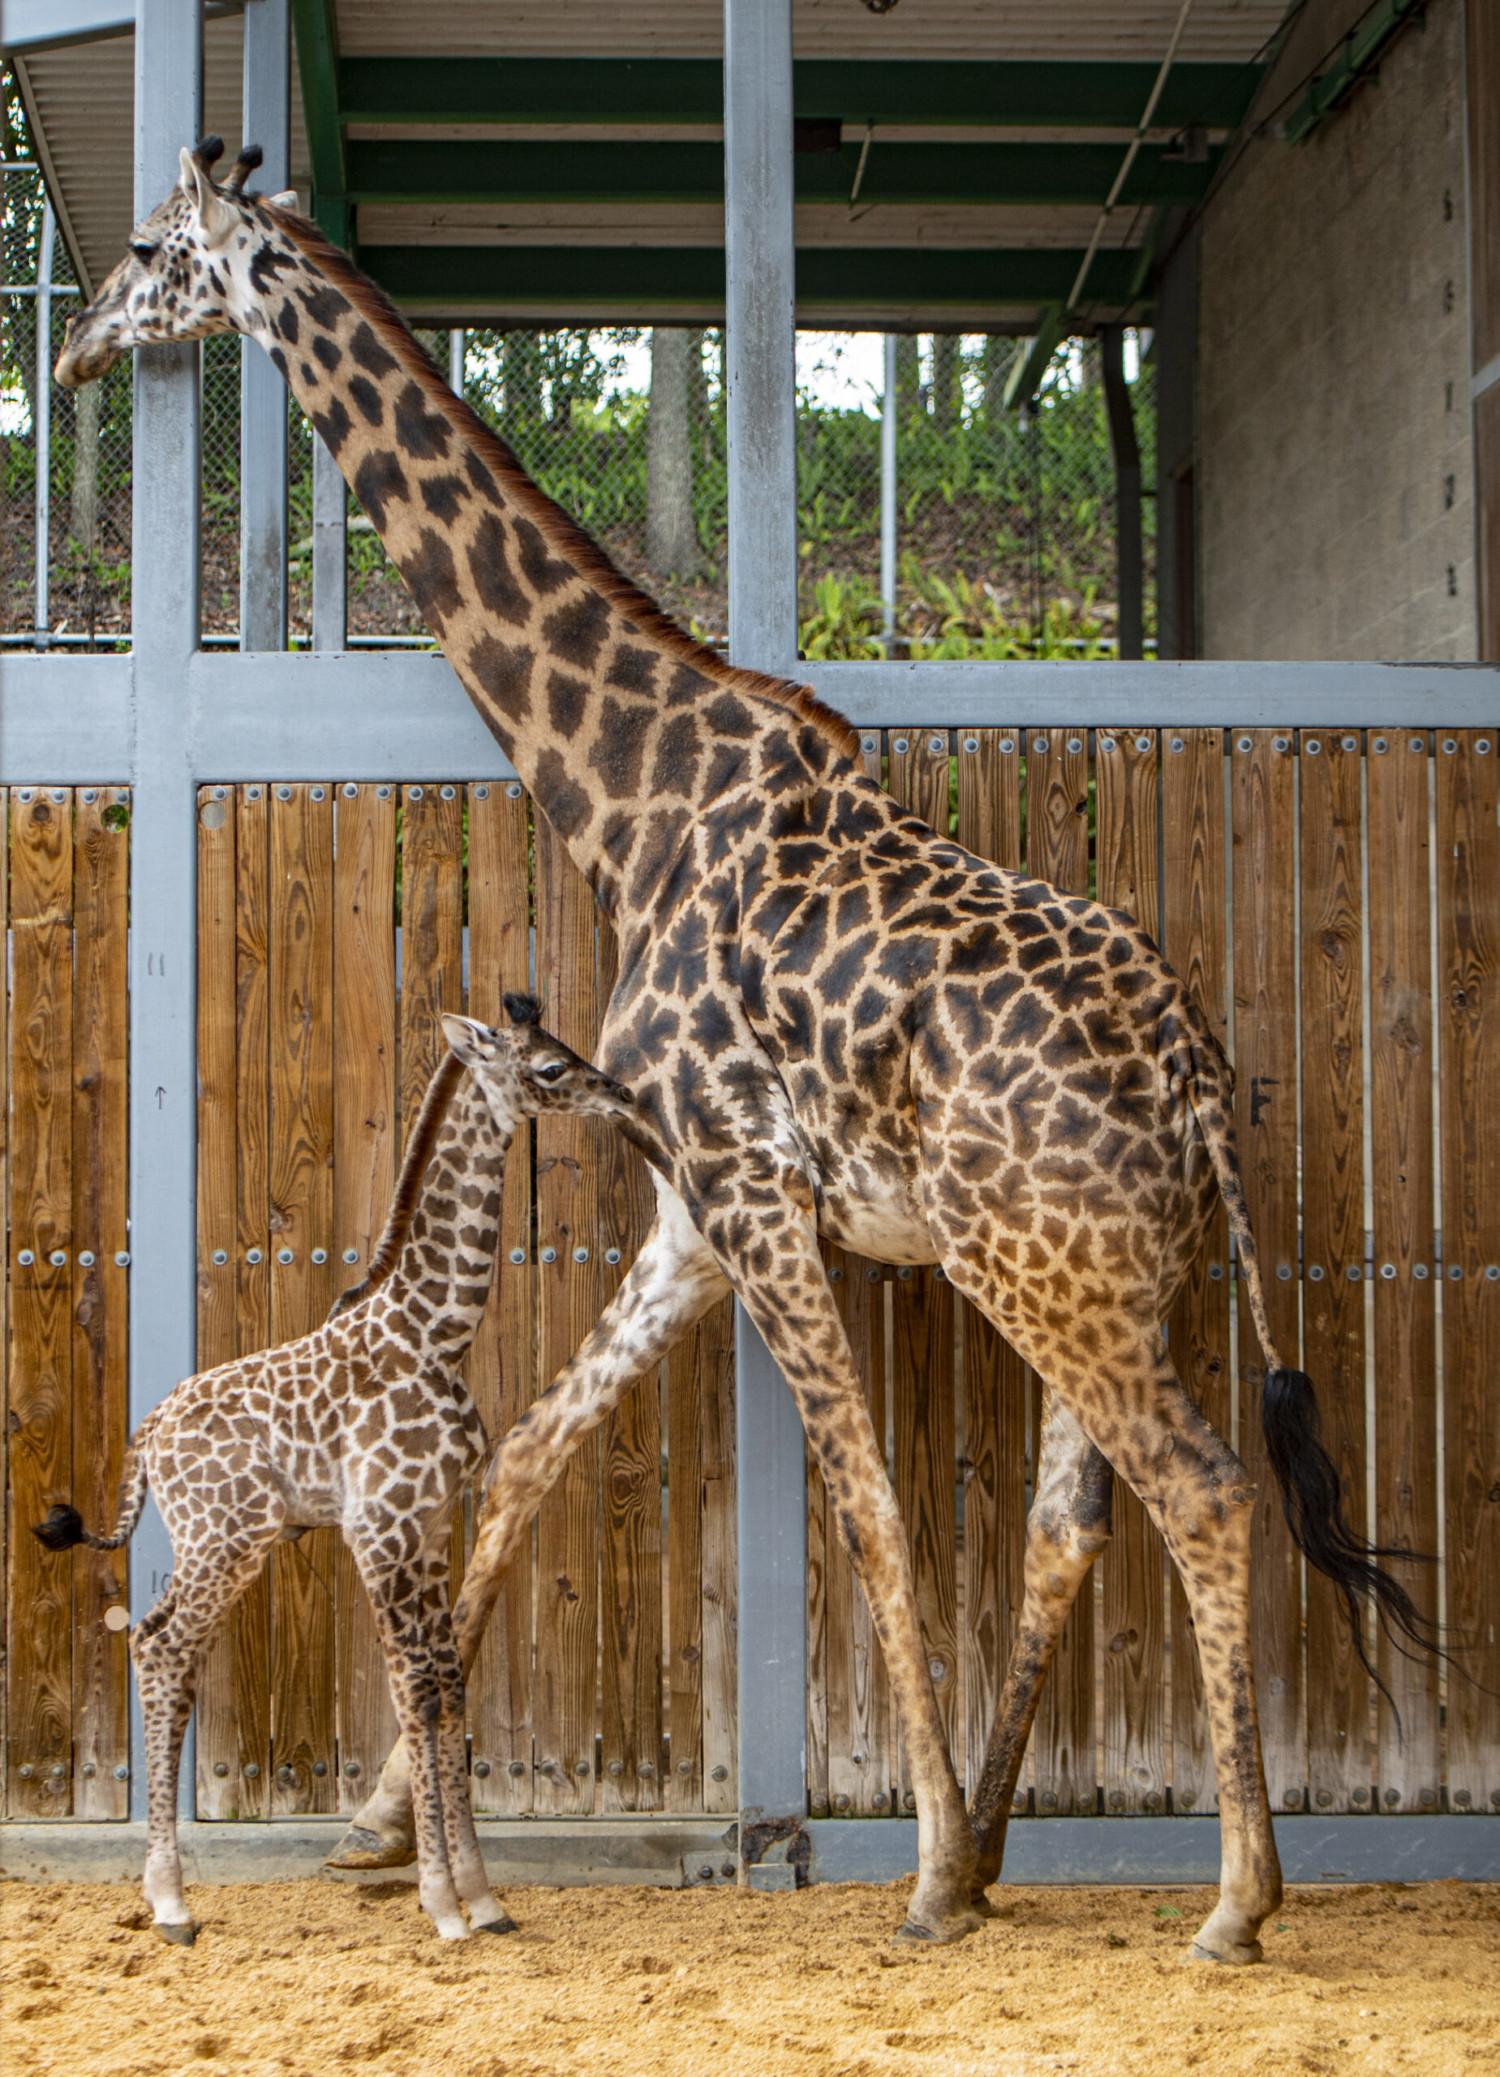 Giraffe Calf and mother Disney World Animal Kingdom